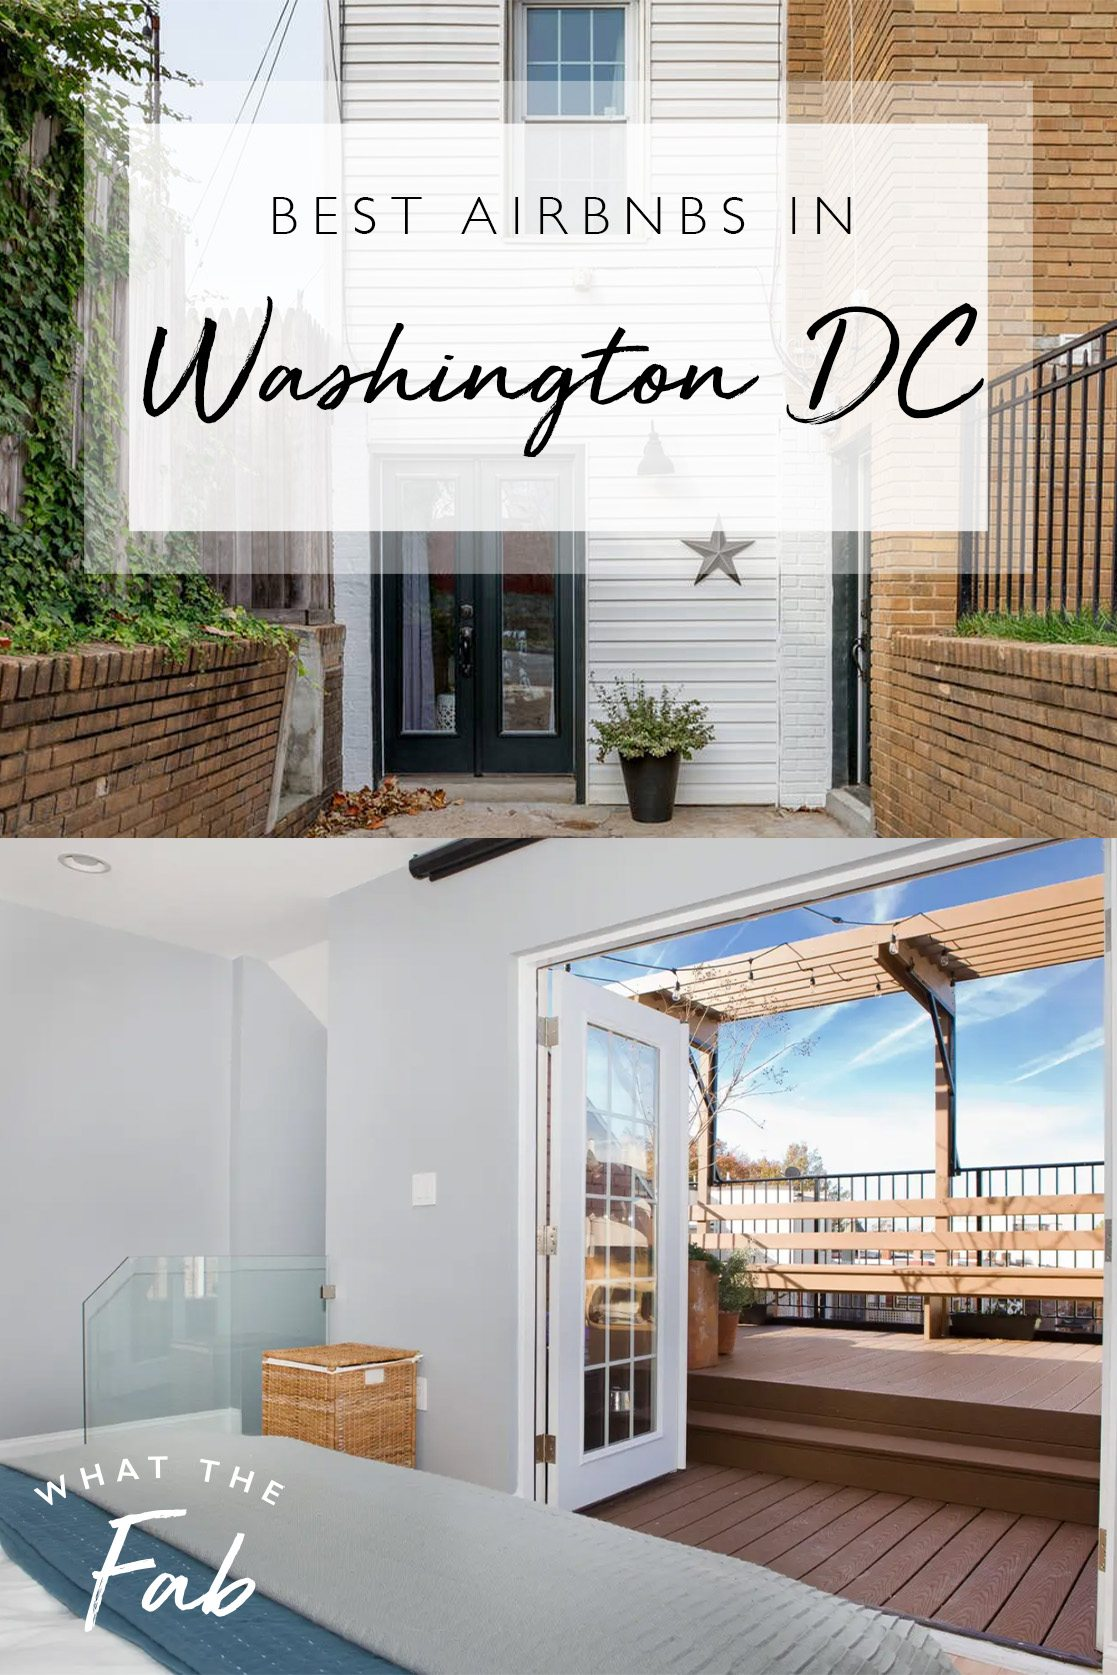 Airbnb Washington